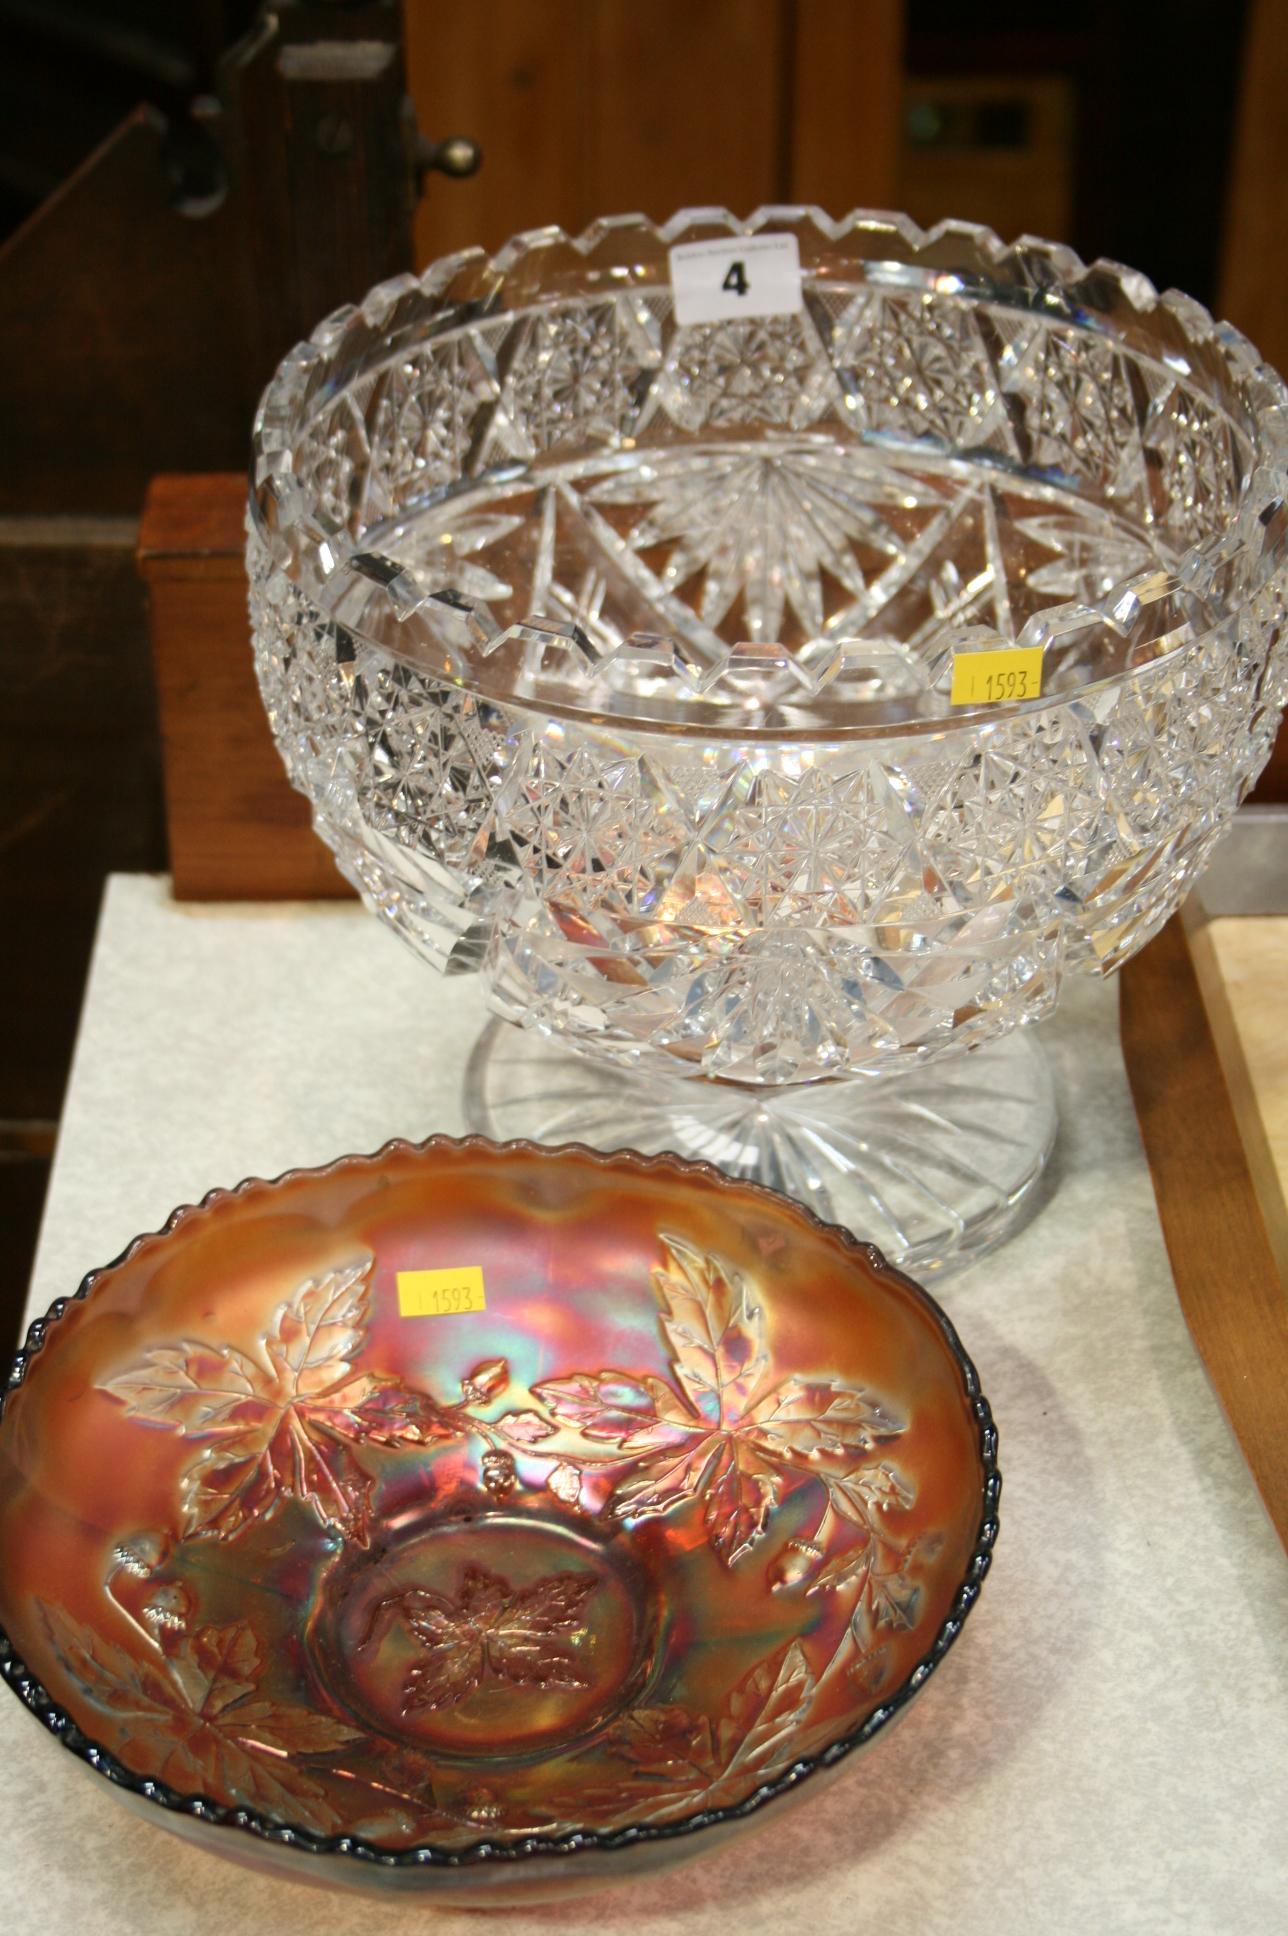 Lot 4 - Cut glass bowl etc.